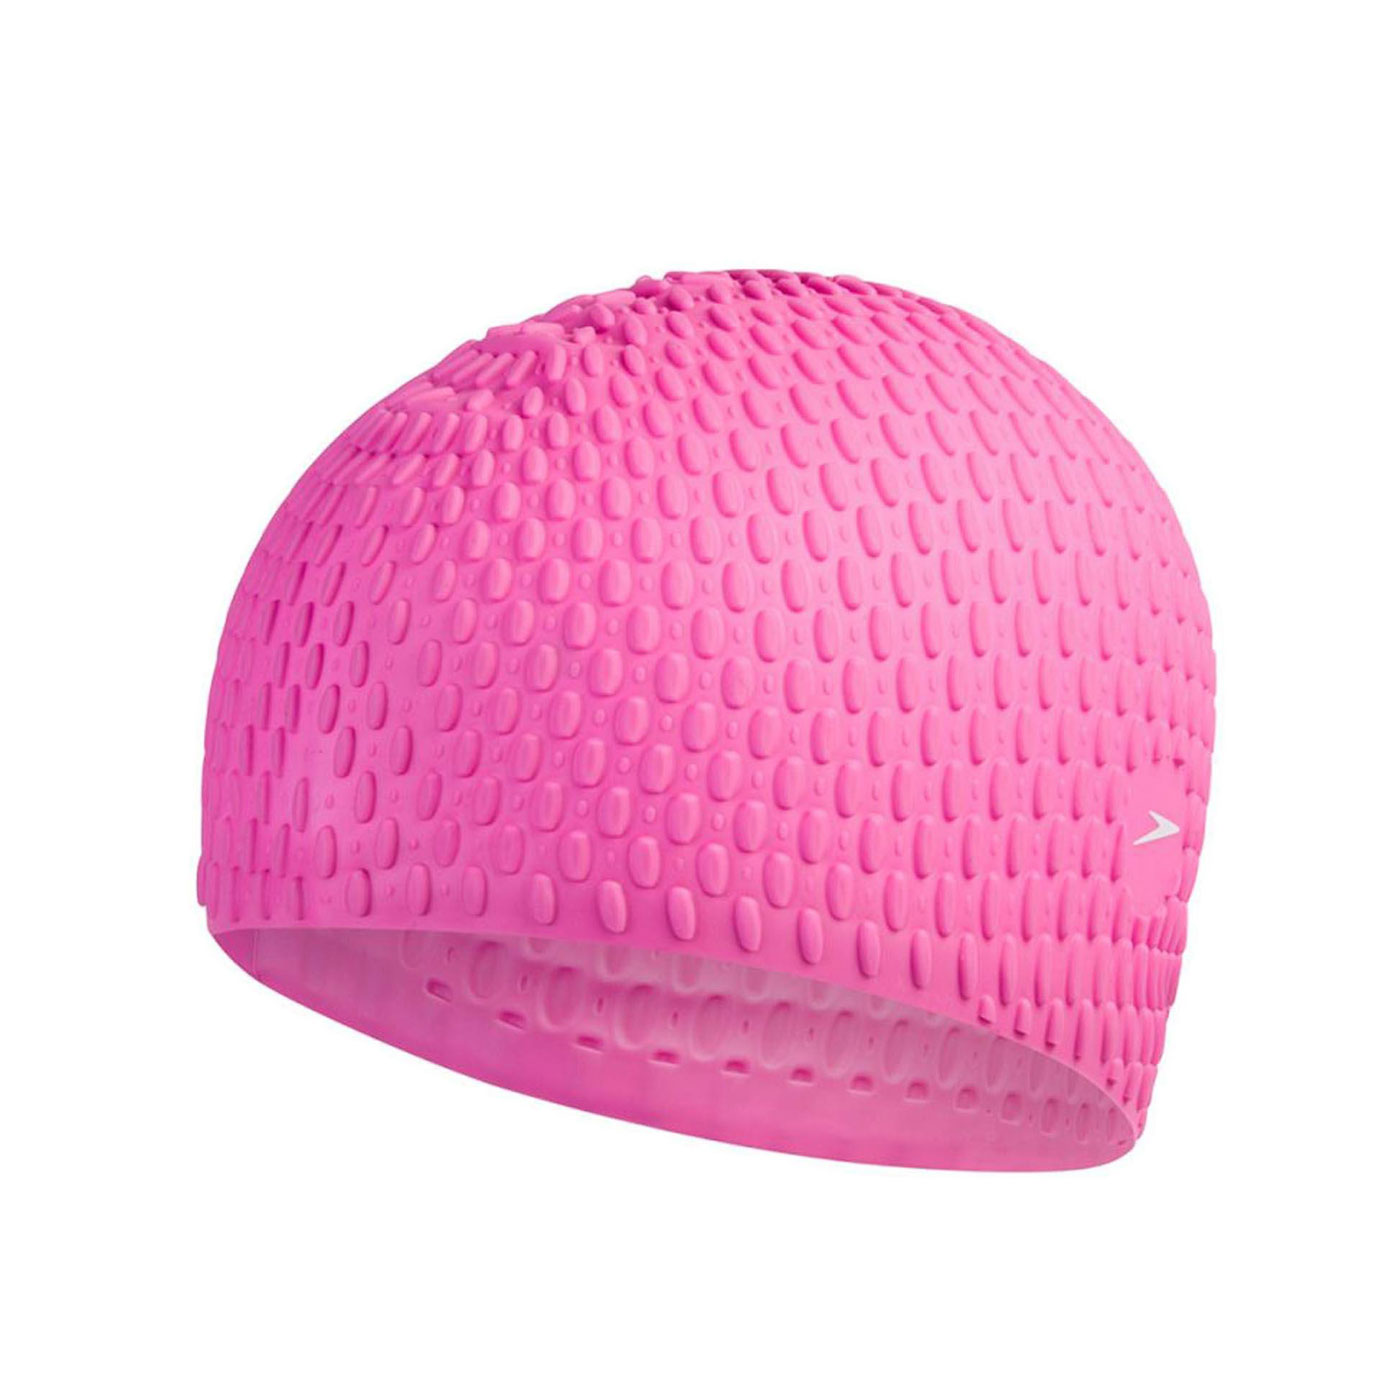 SPEEDO 成人矽膠泳帽 Bubble SD870929D669 - 桃紅白